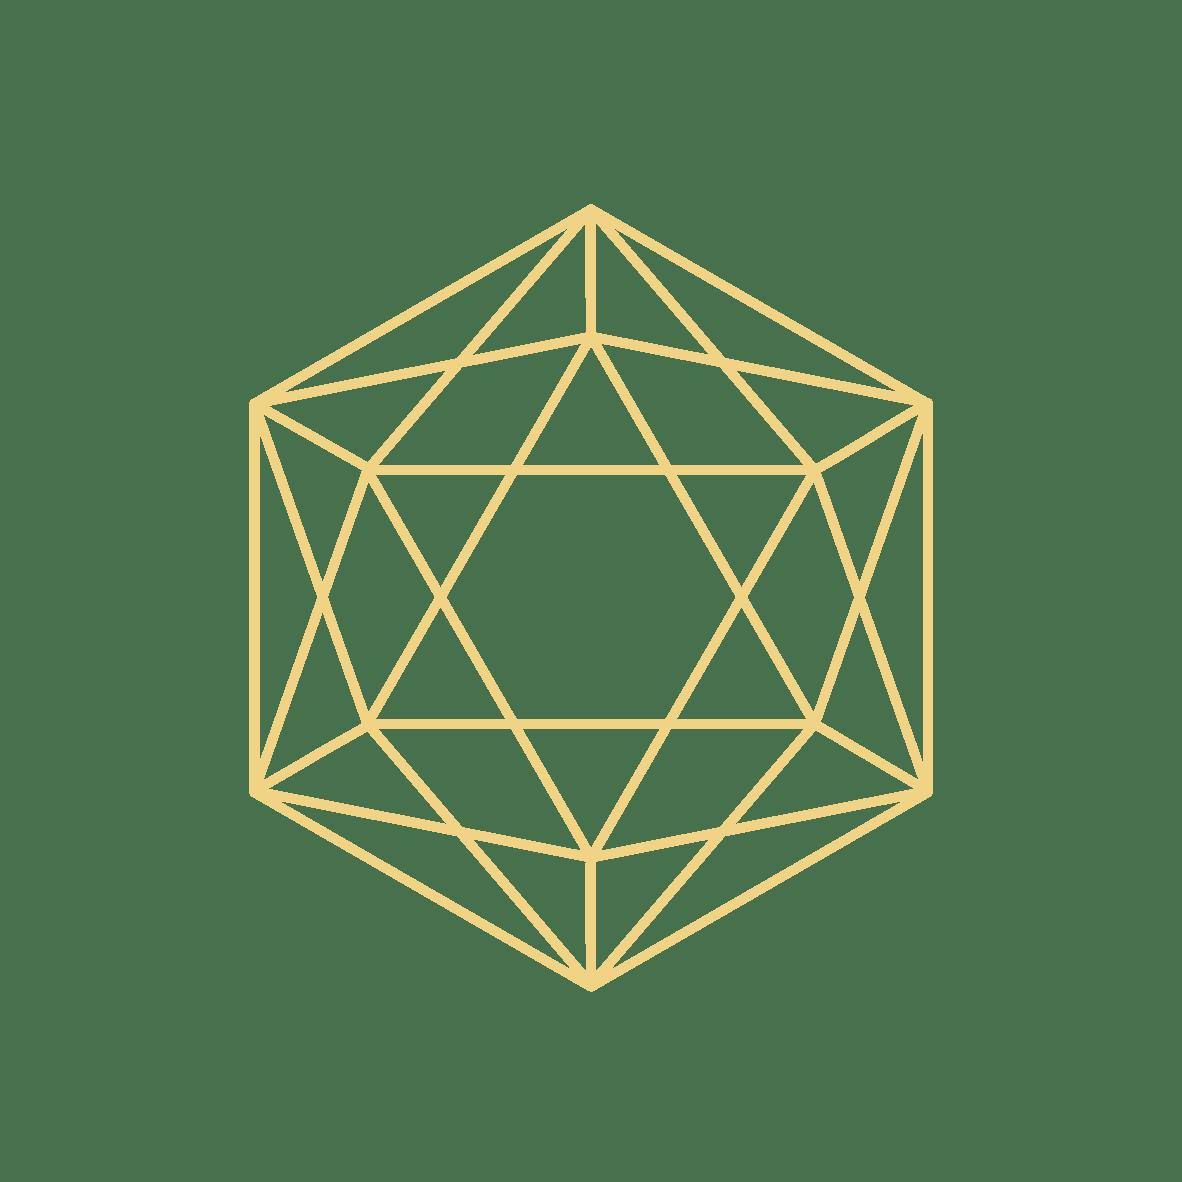 Kraftsymbol gelb CMYK